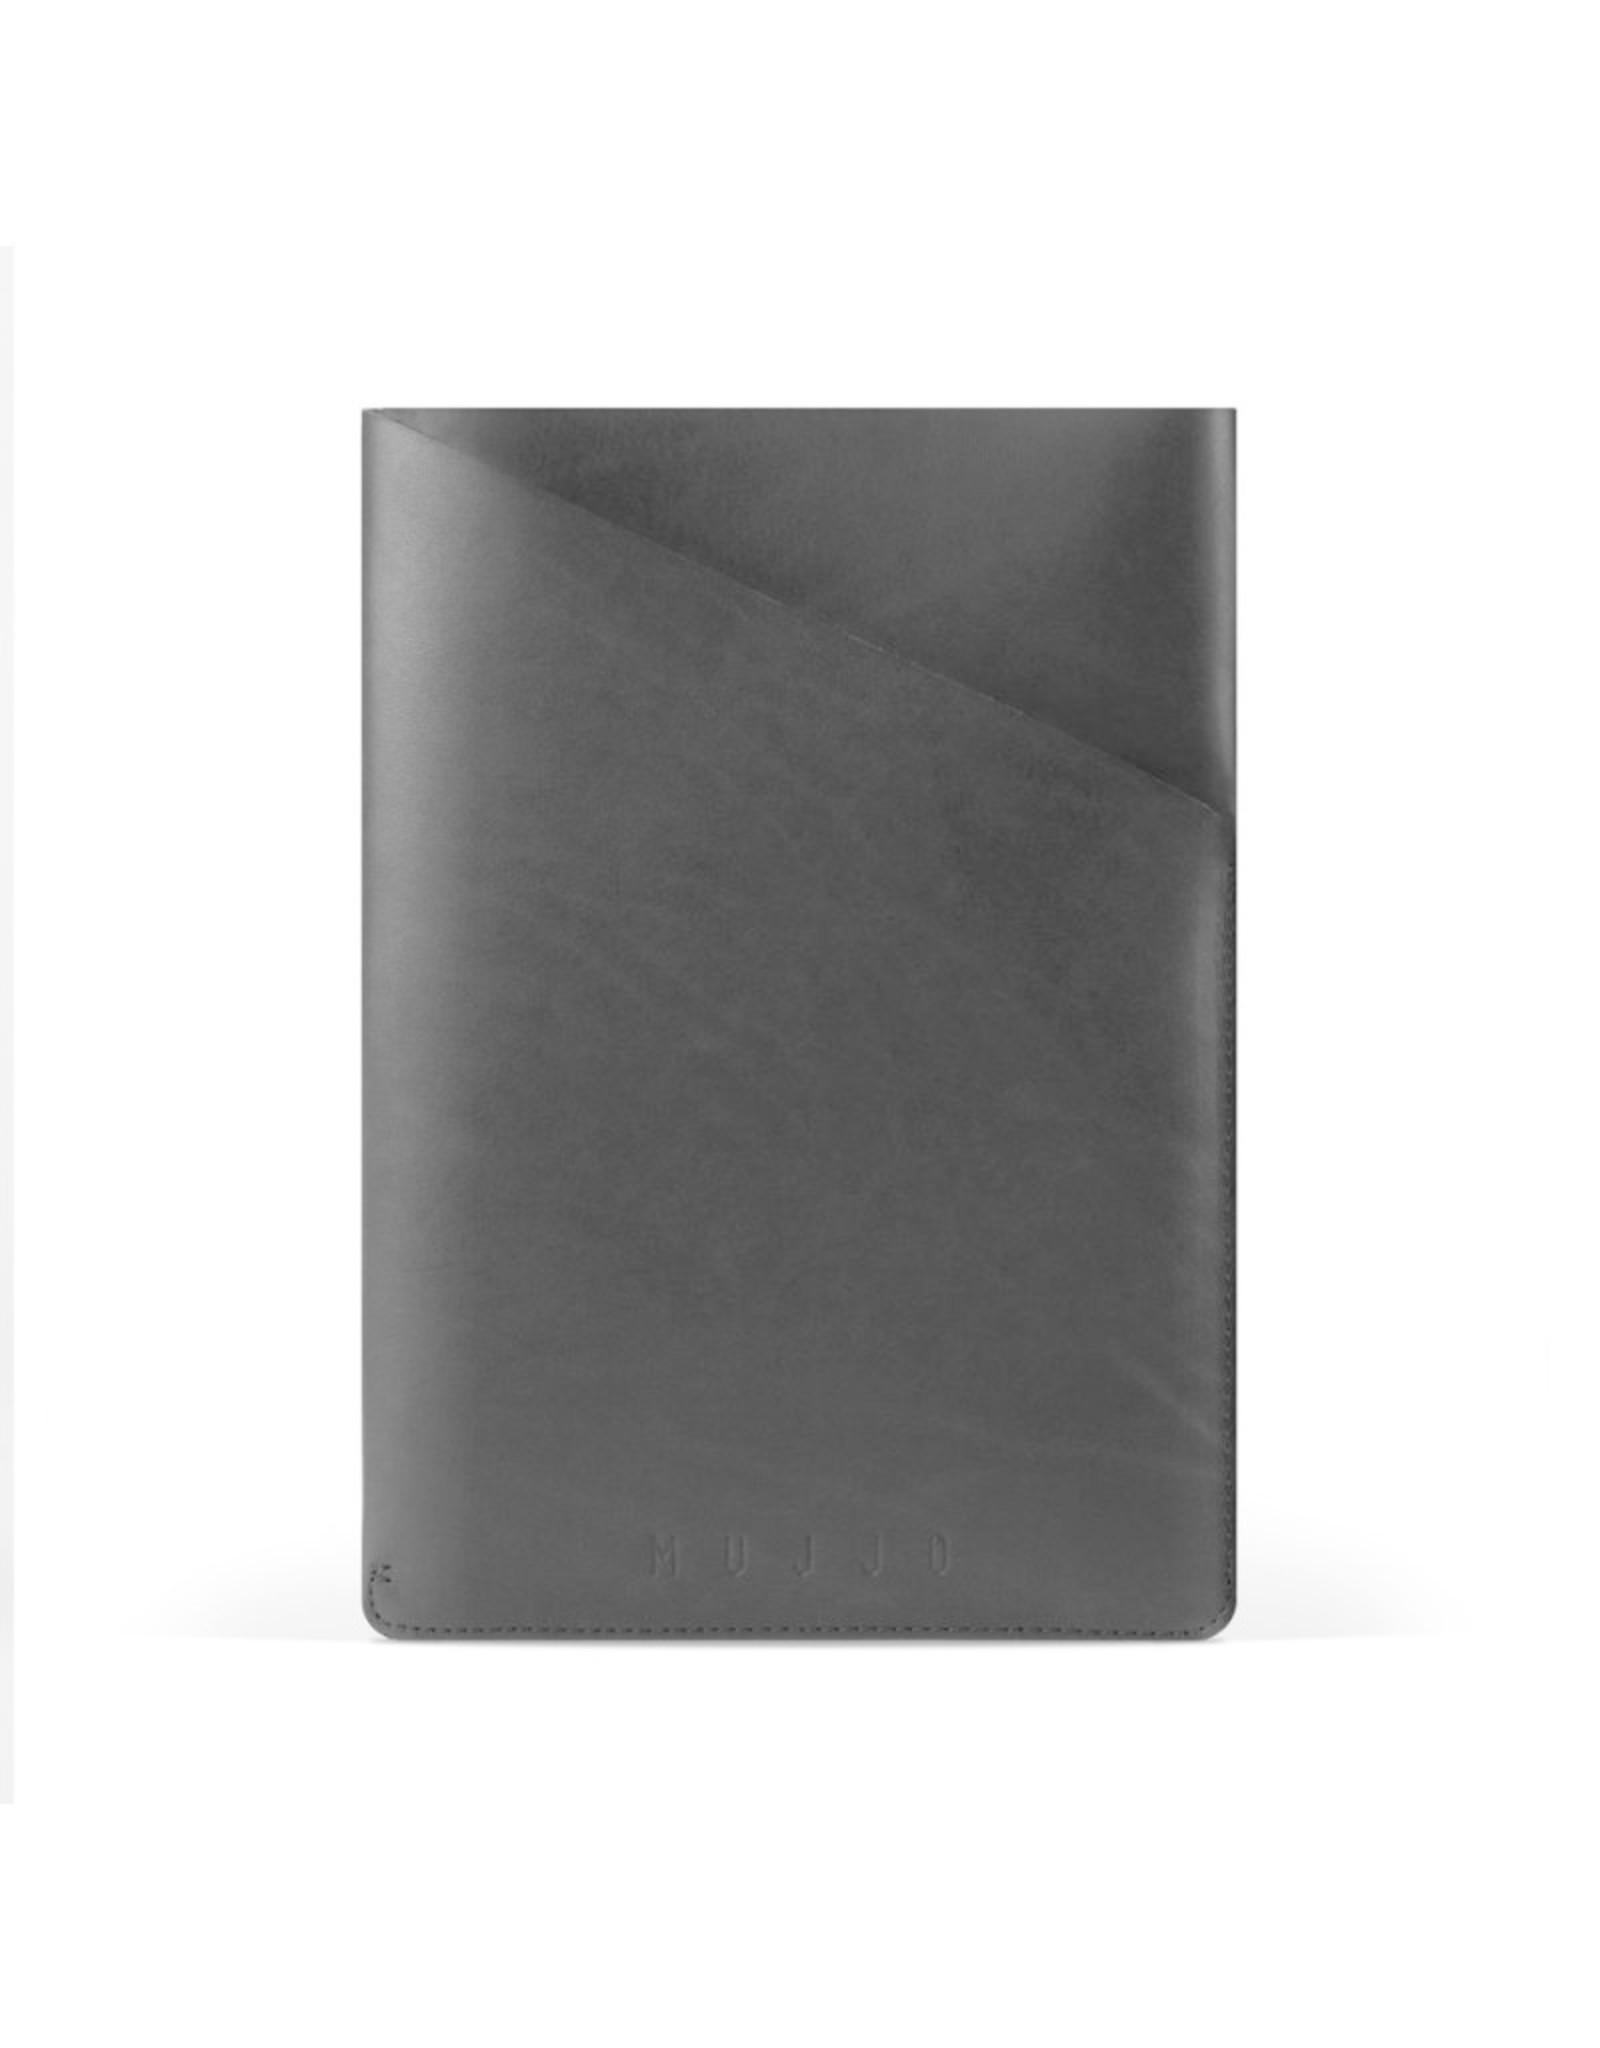 Mujjo Mujjo Slim Fit iPad Air Sleeve - Black